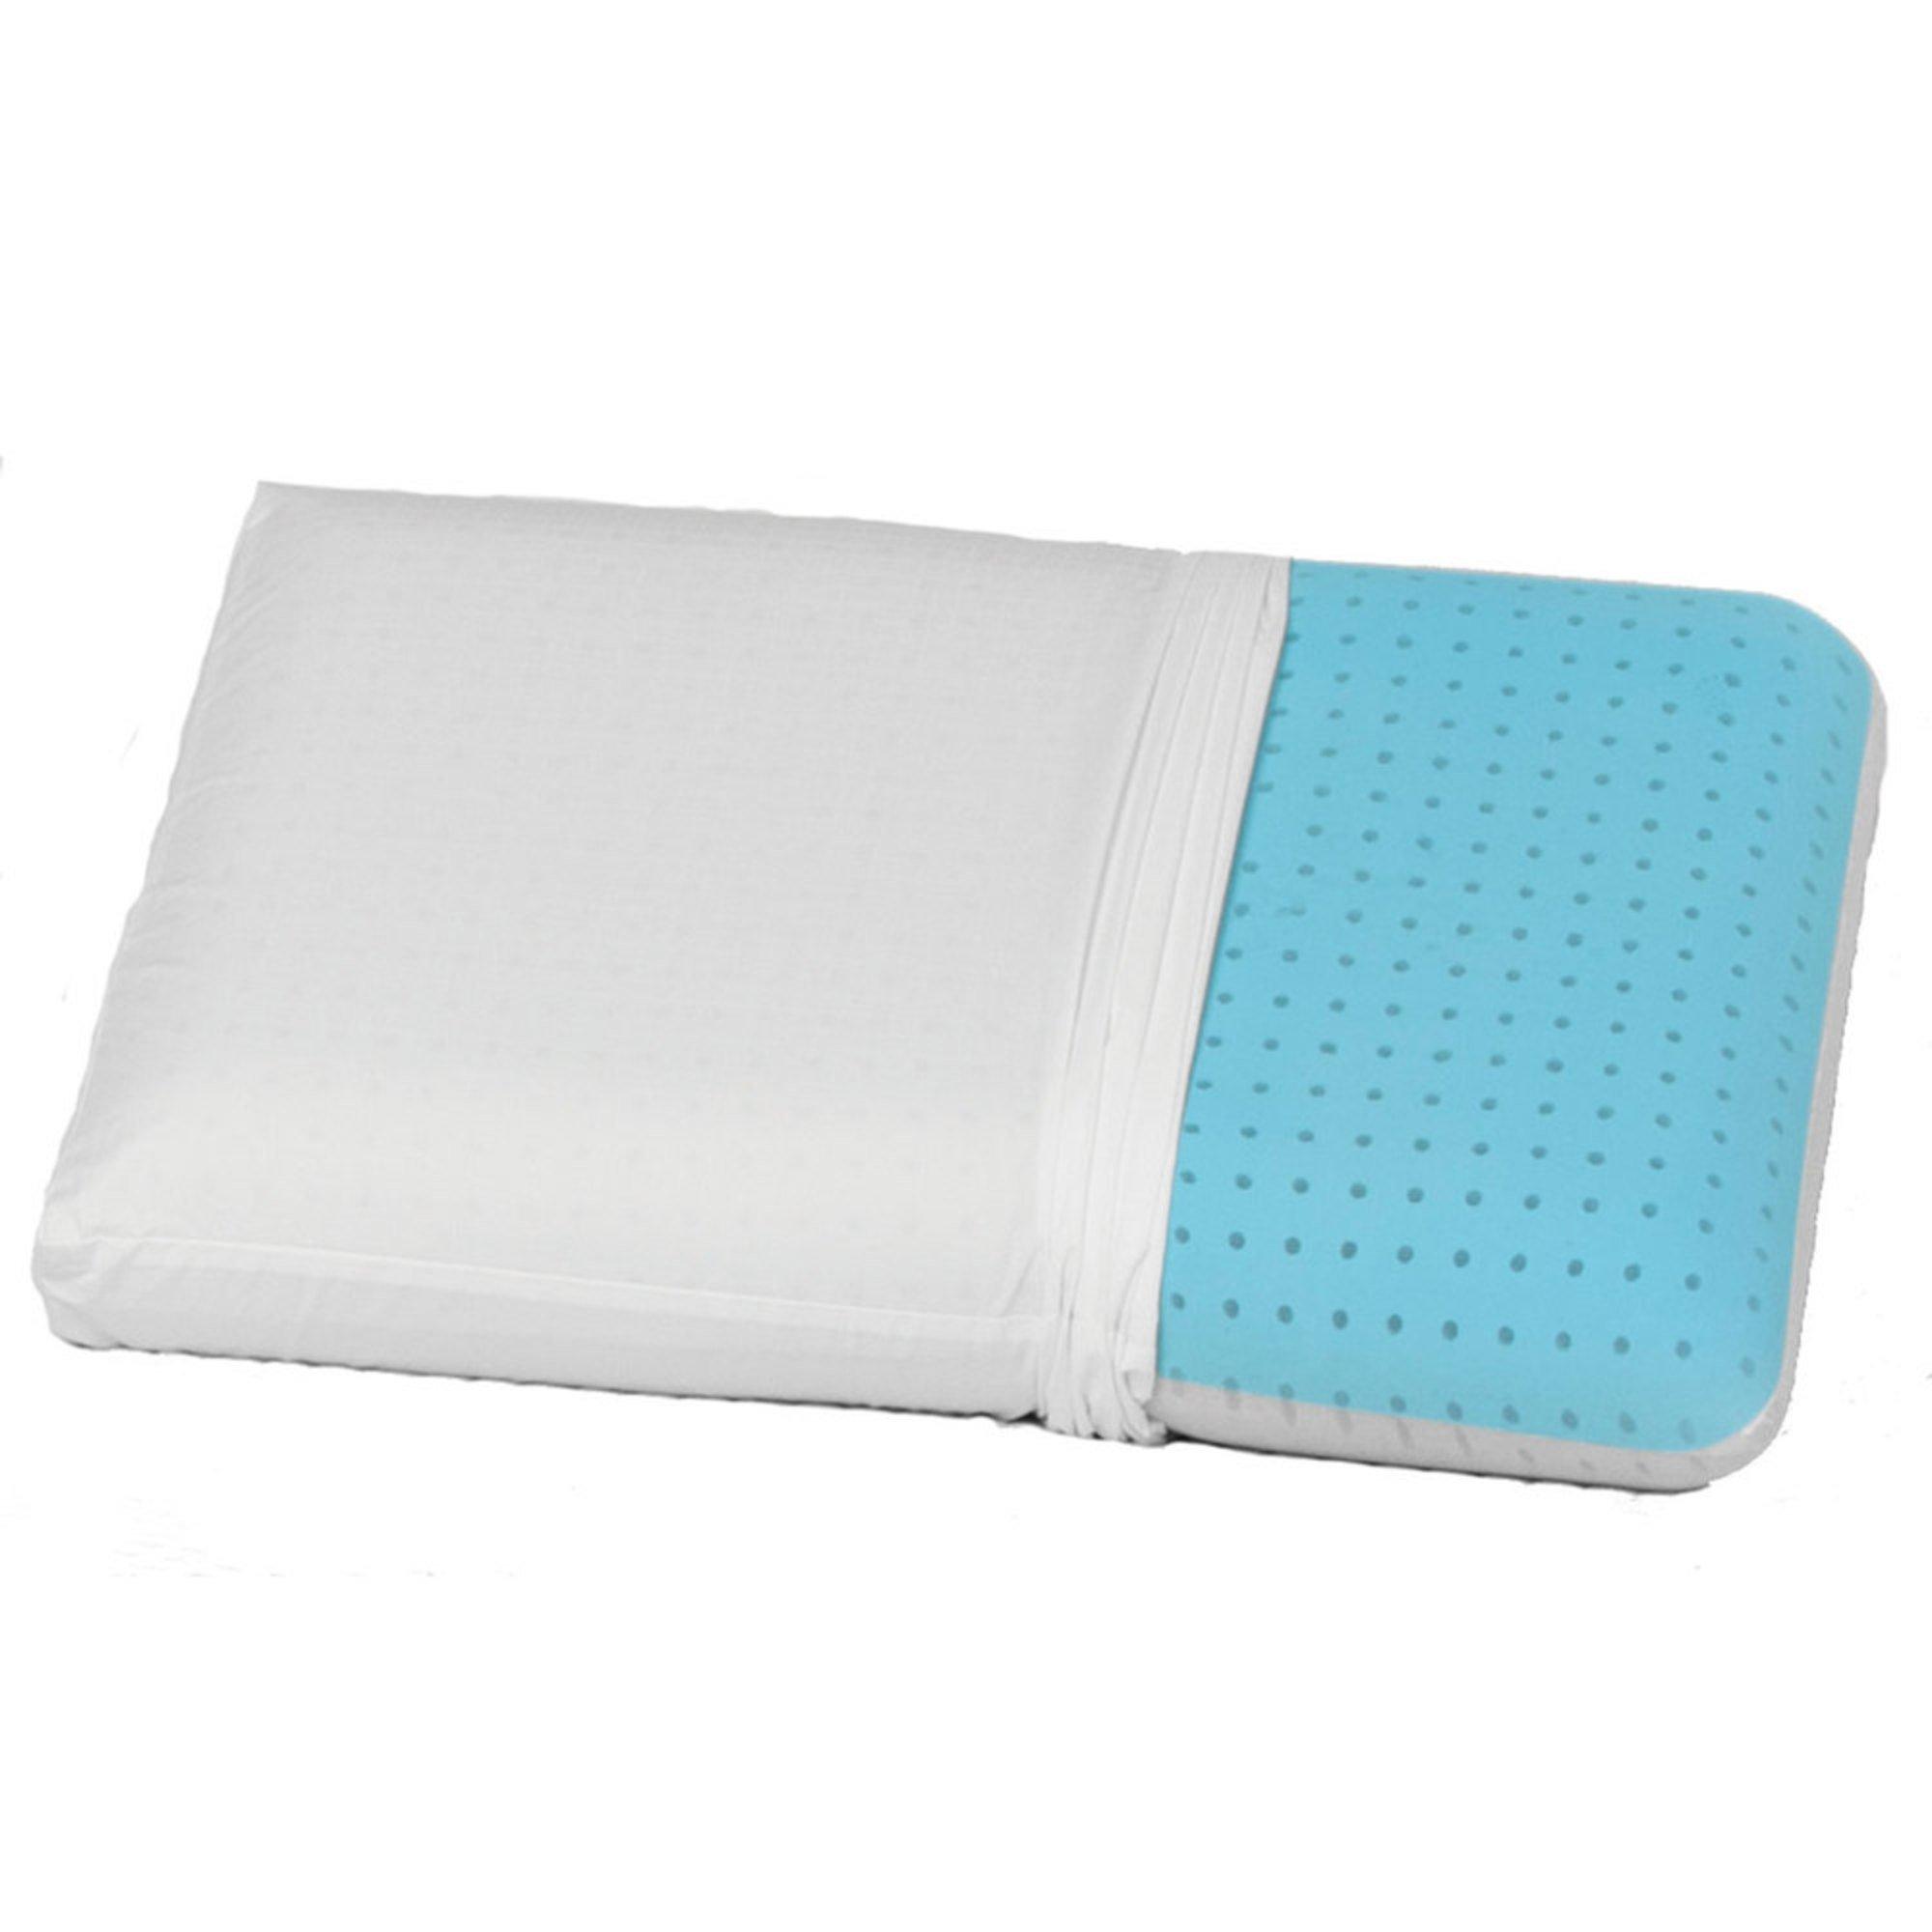 Beautyrest Hydrogel Memory Foam Cooling Pillow  Bed